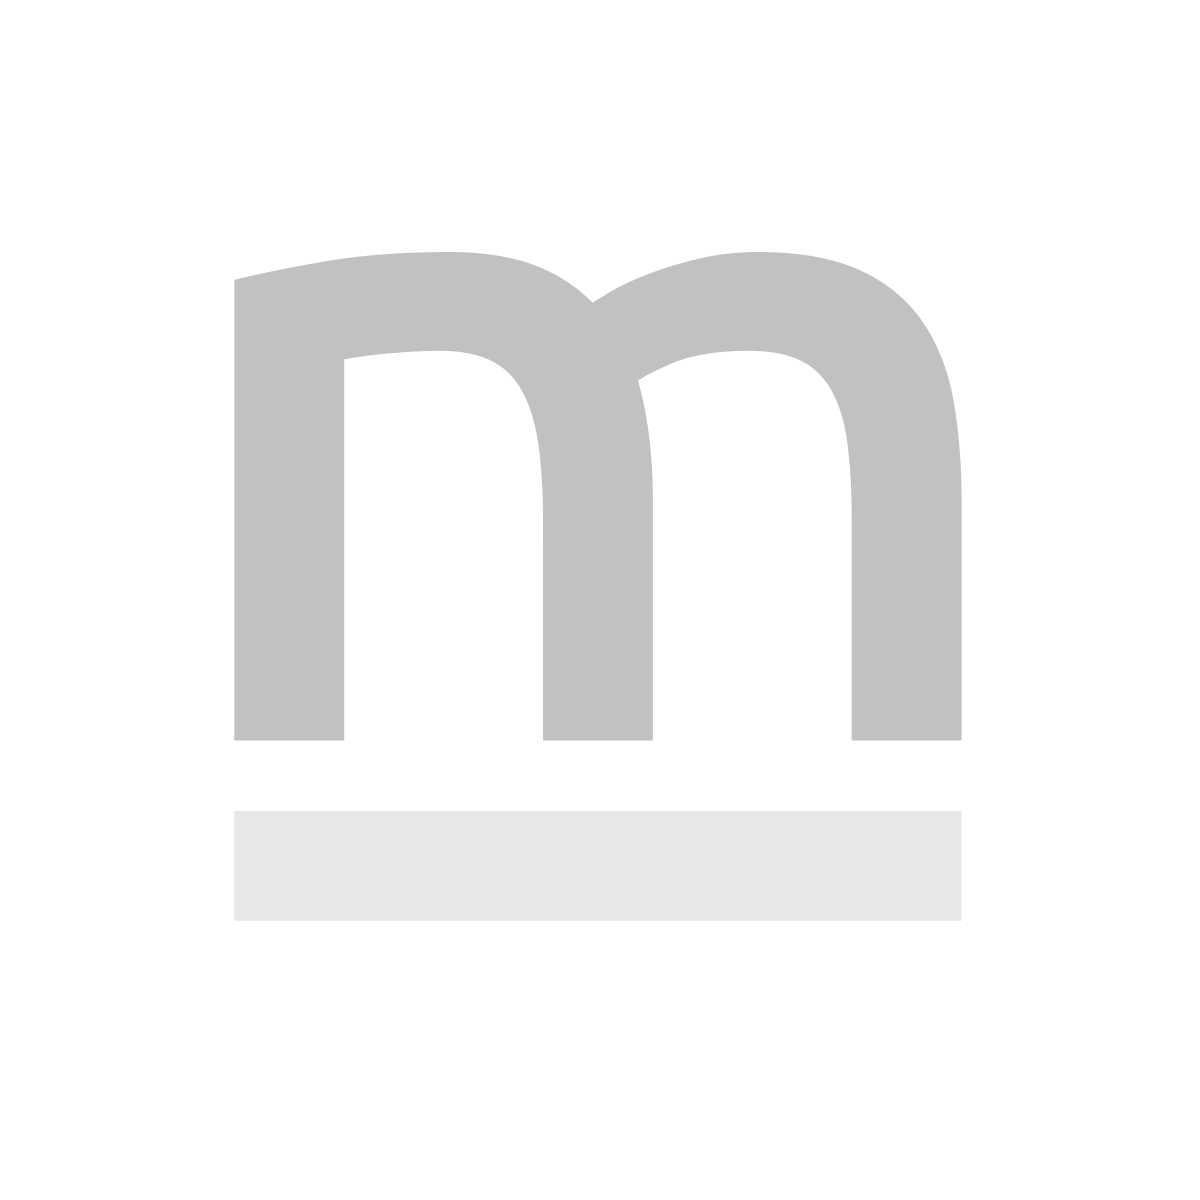 Parawan 5-częściowy - Bananana II [Room Dividers]